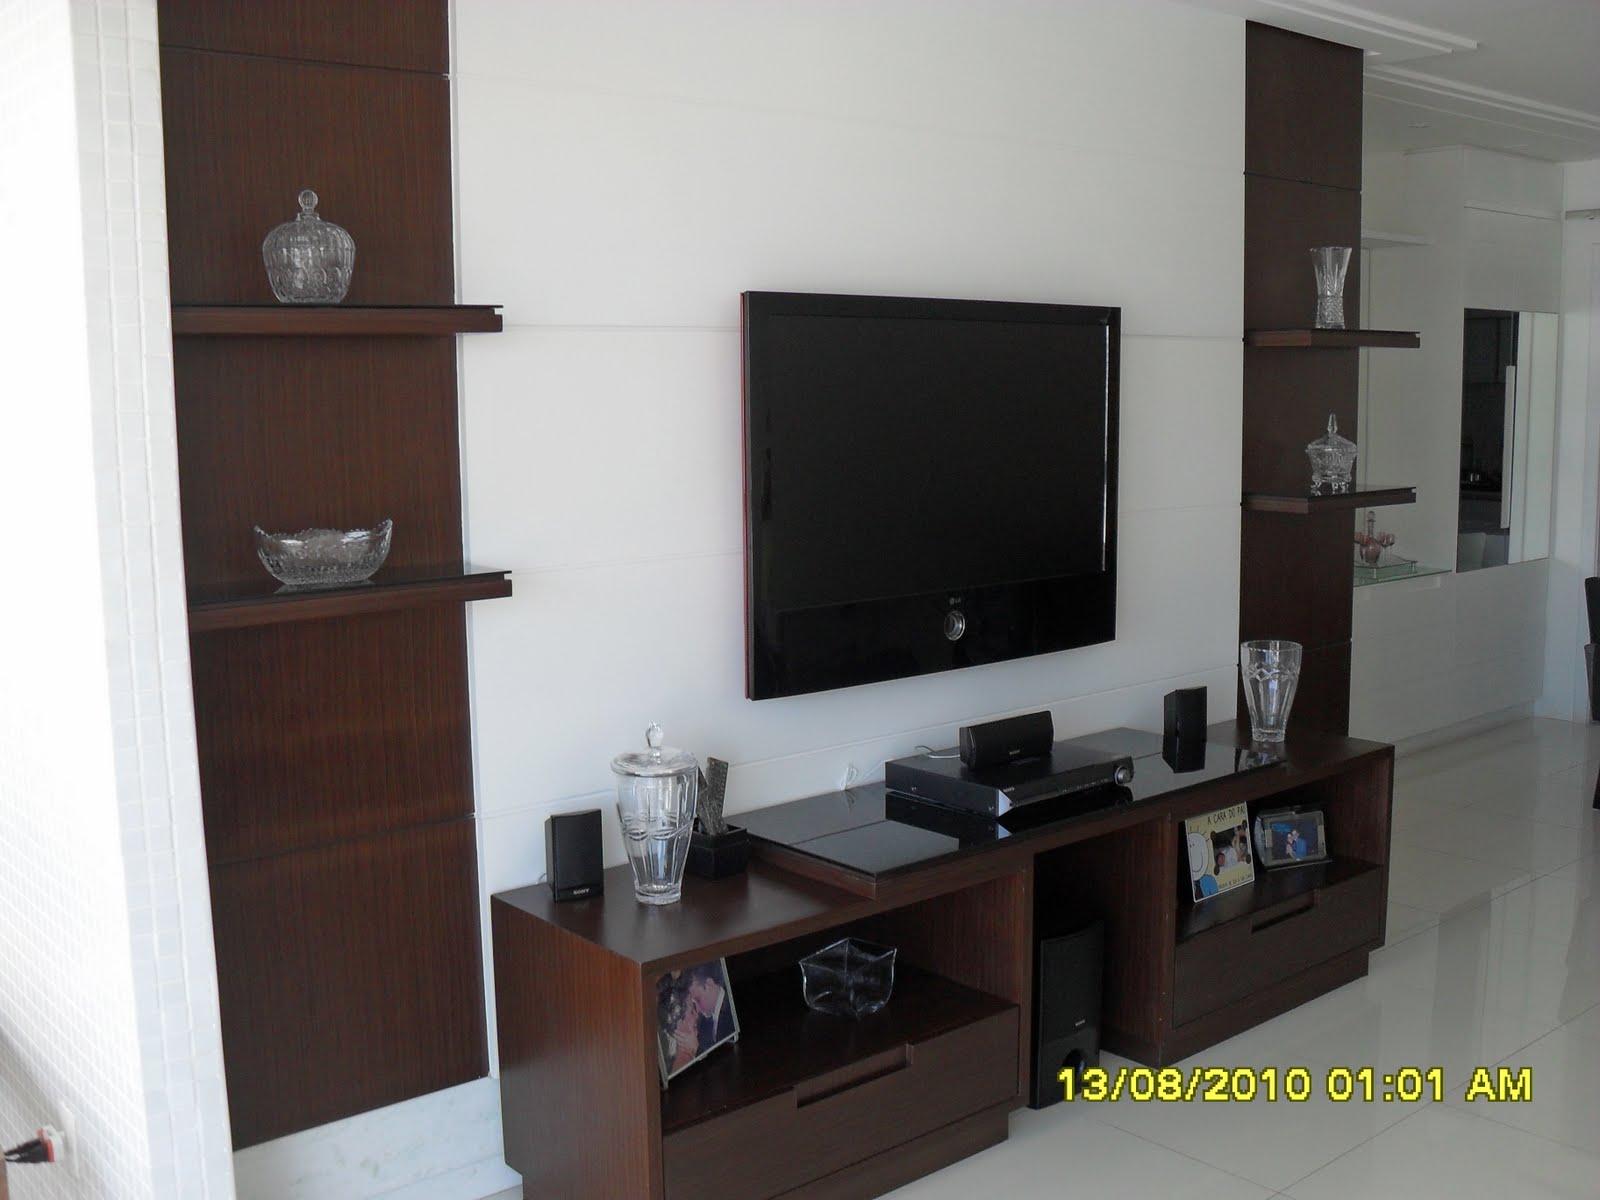 marcenaria e designer morozesk: Painel para TV LCD #A1A229 1600x1200